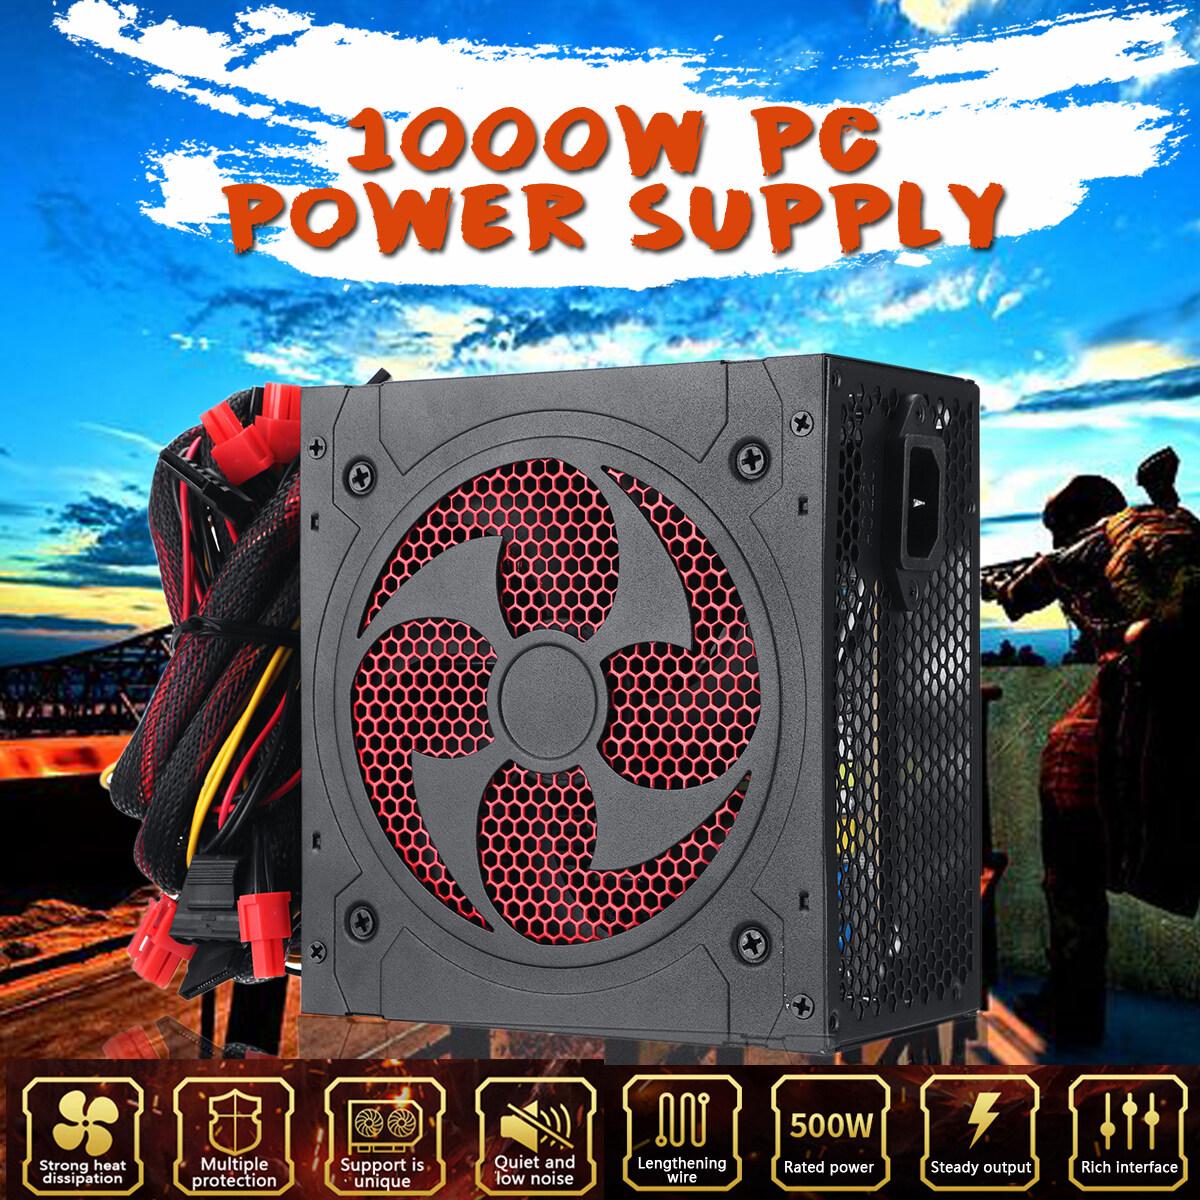 Max 1000W Power Supply PSU PFC Silent Fan ATX 12V PC Computer SATA Gaming PC Power Supply For Intel AMD Computer